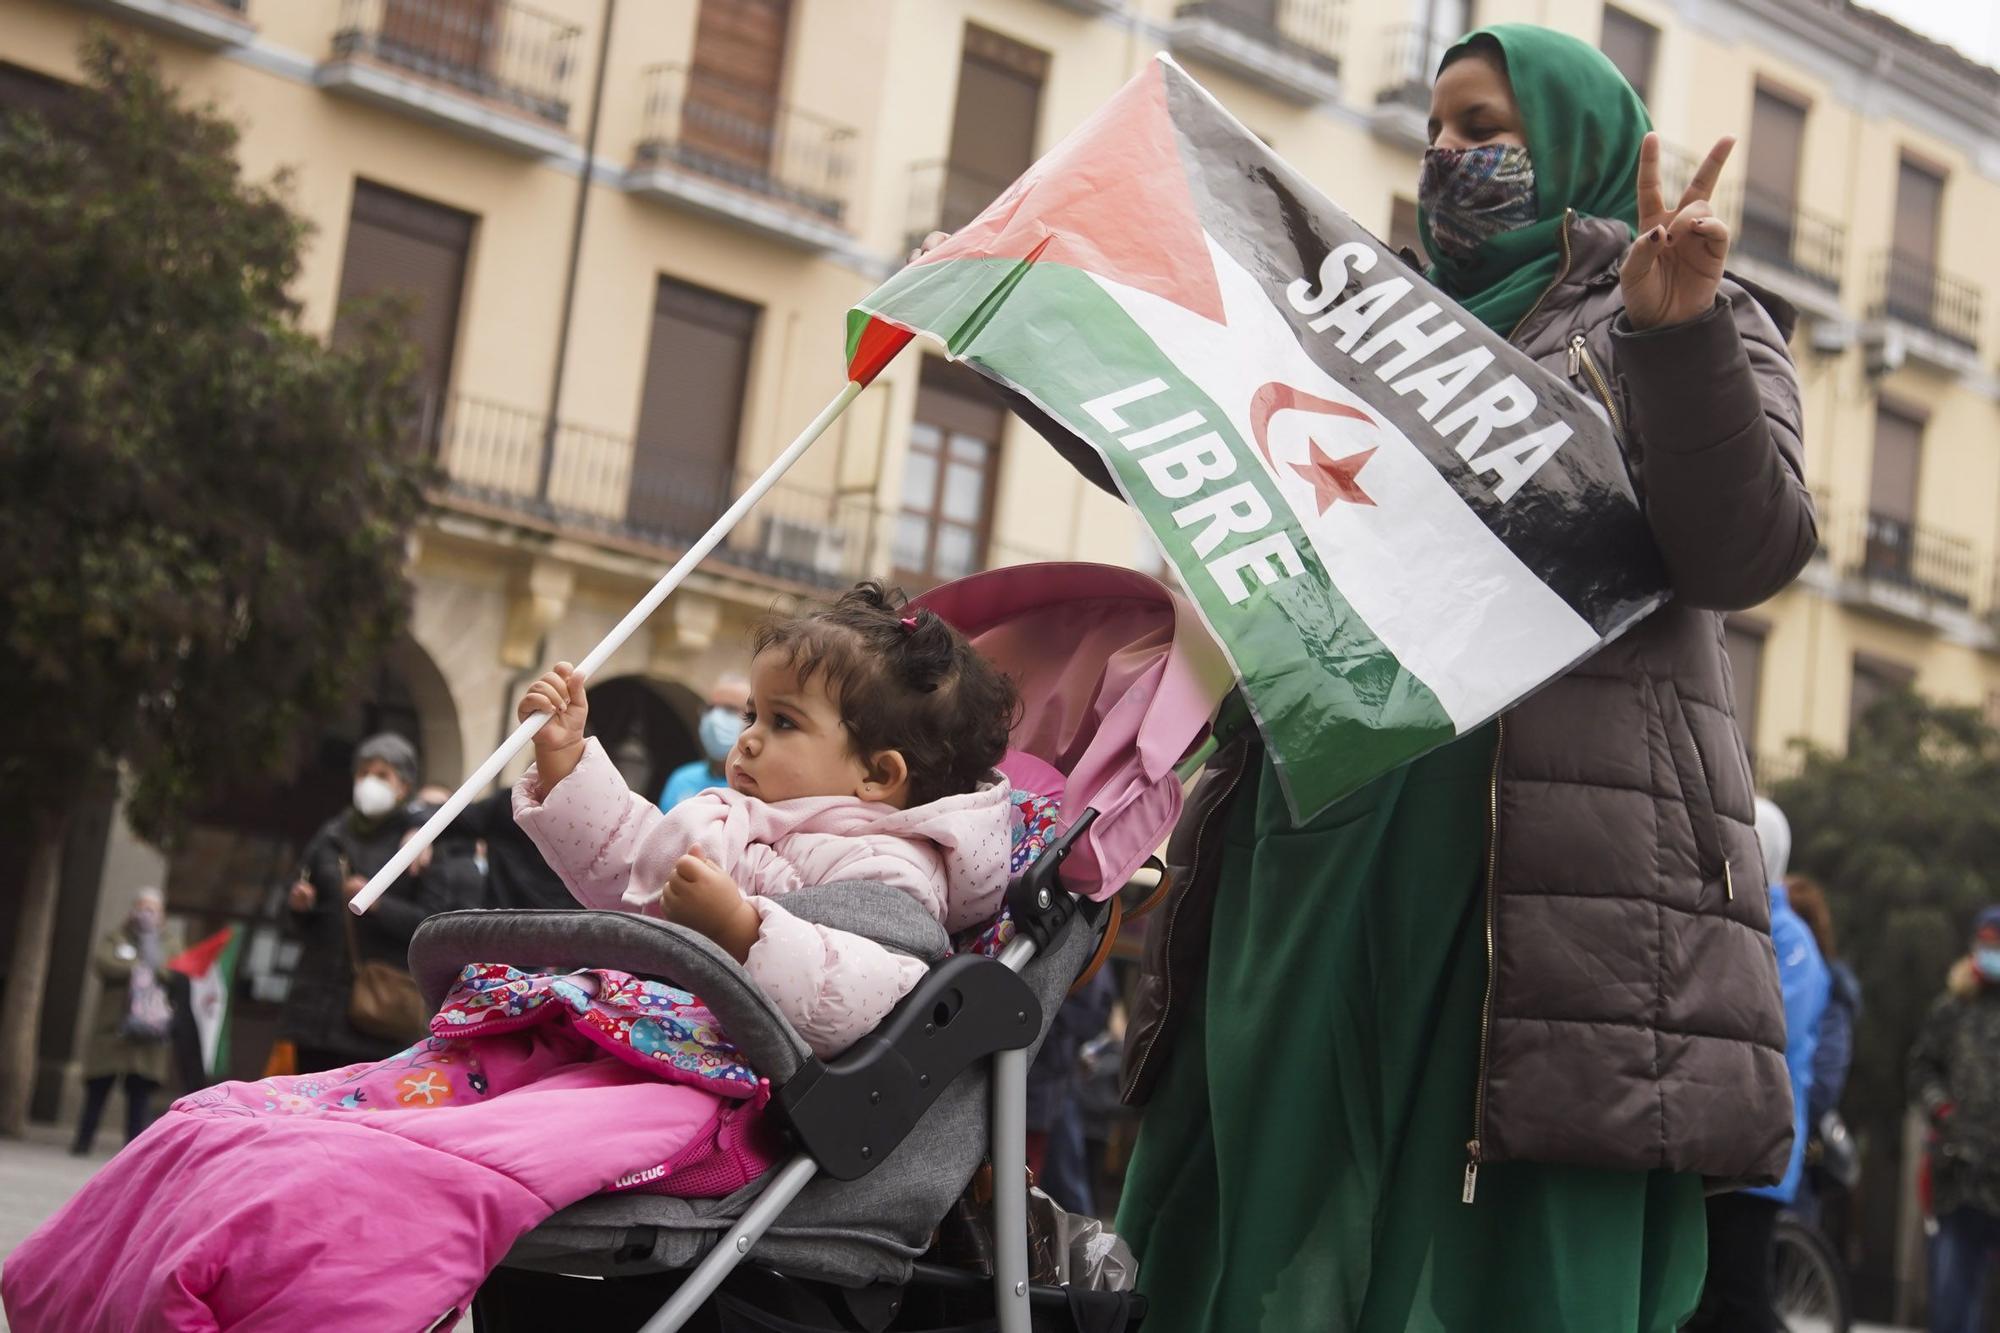 GALERÍA | Zamora se moviliza para pedir un Sáhara libre